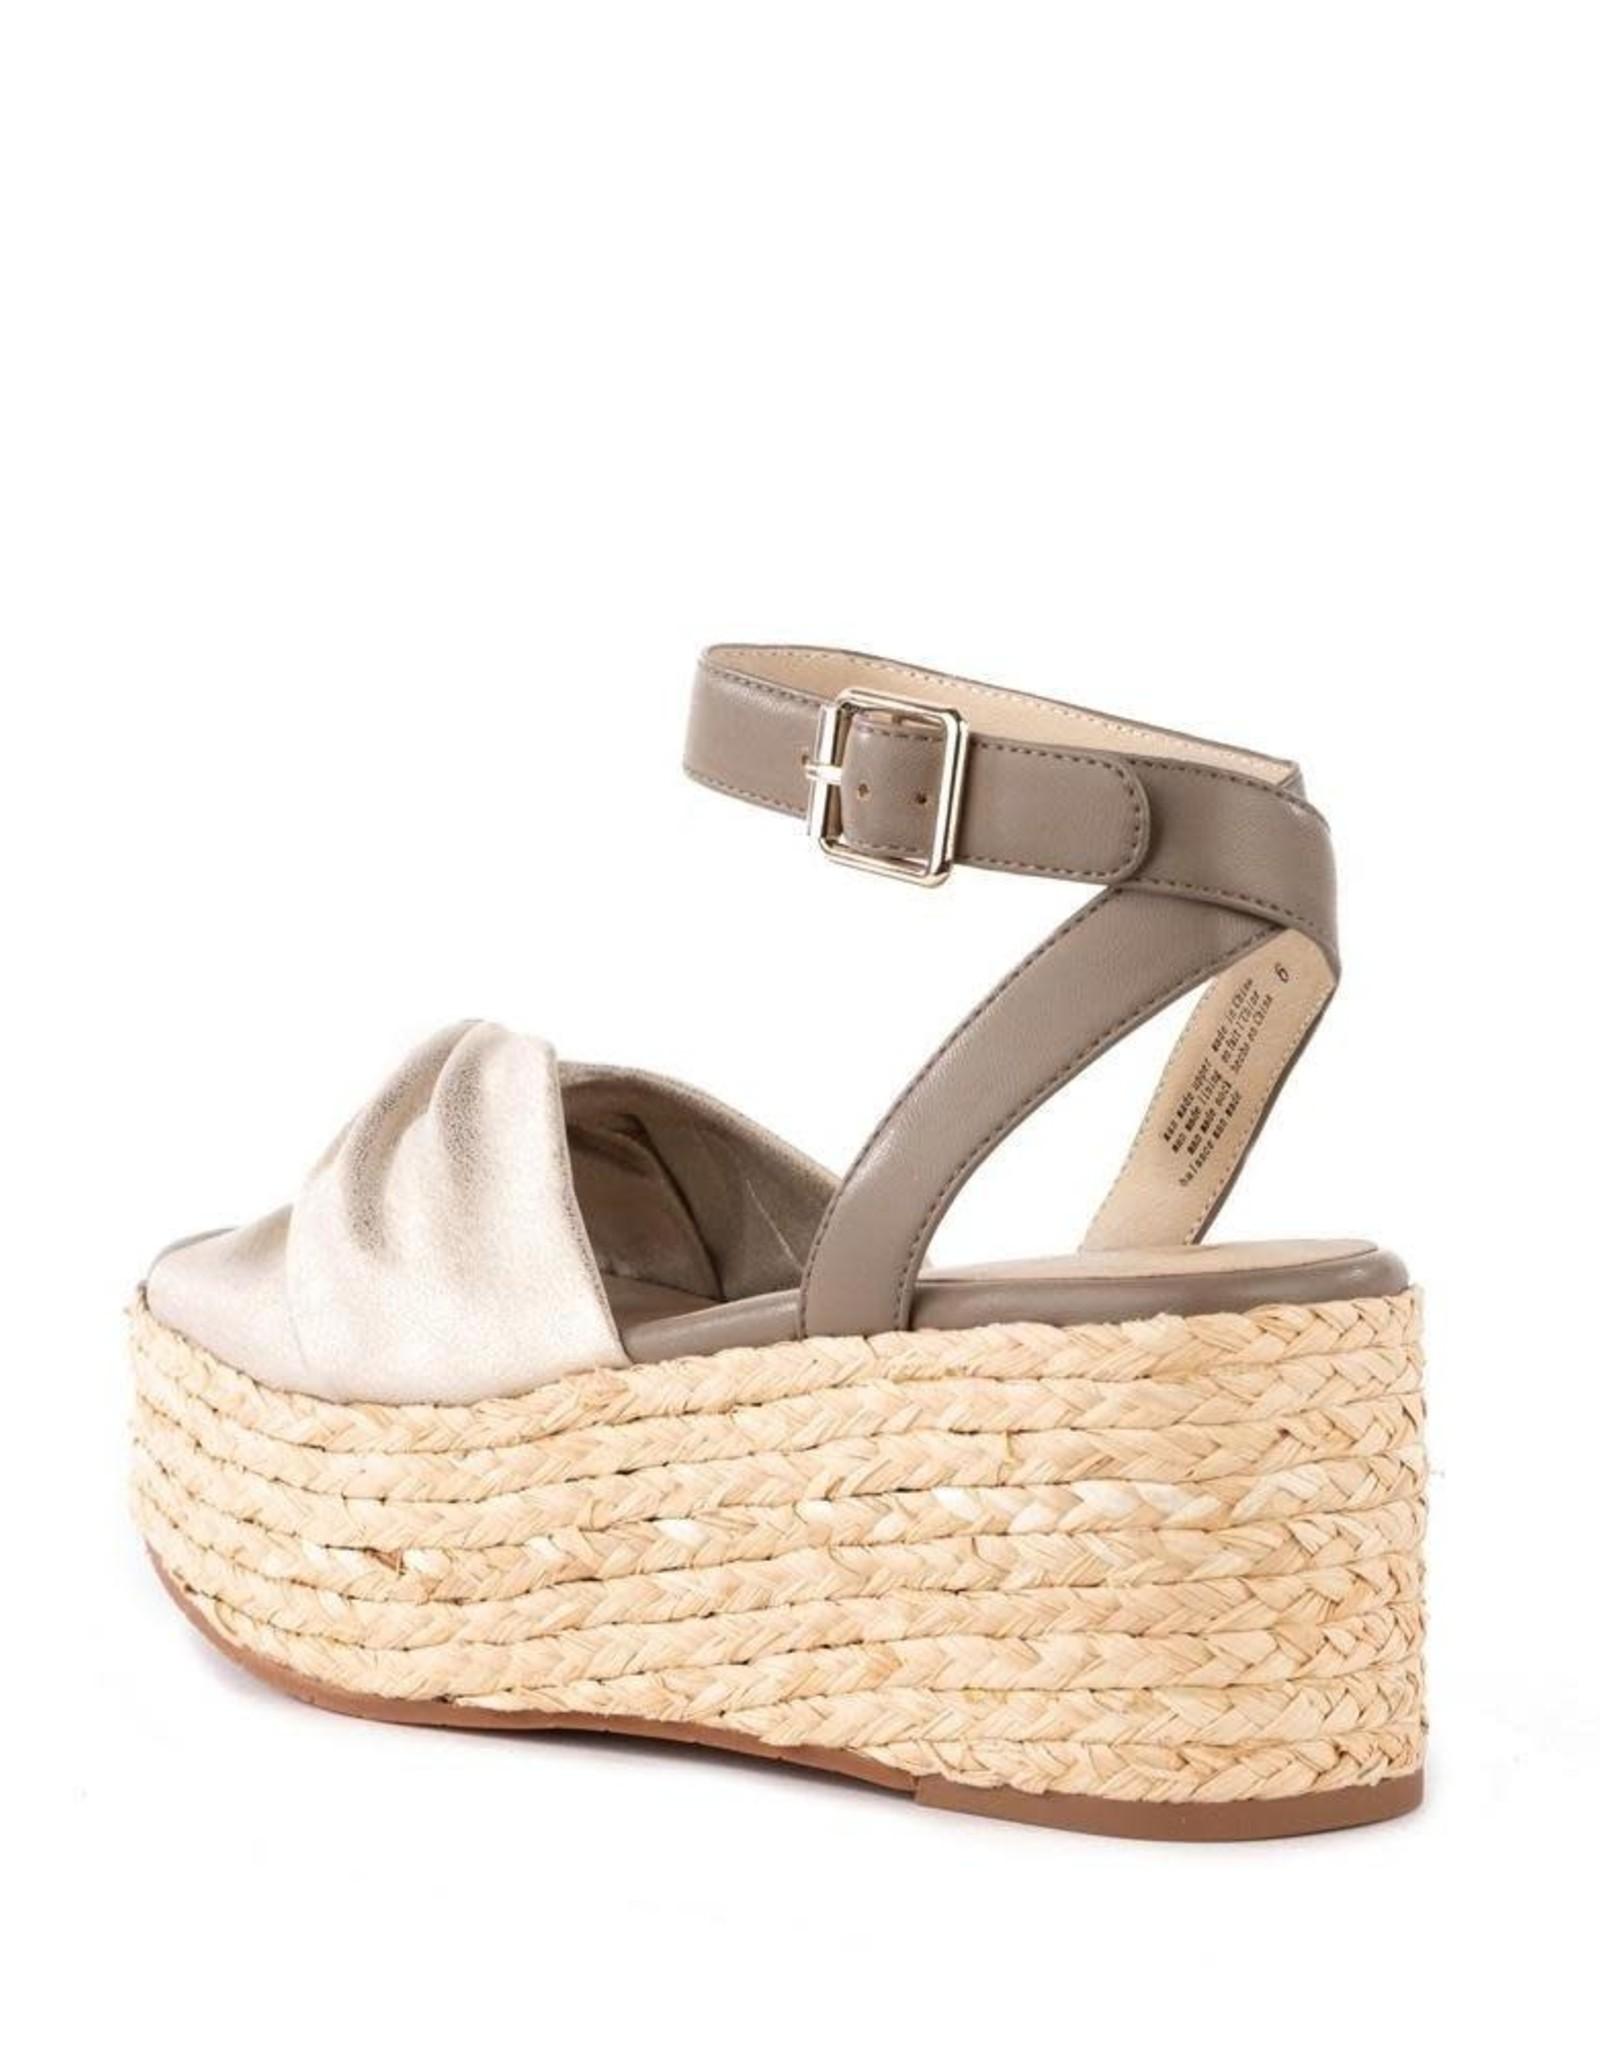 WINNING wedge sandal